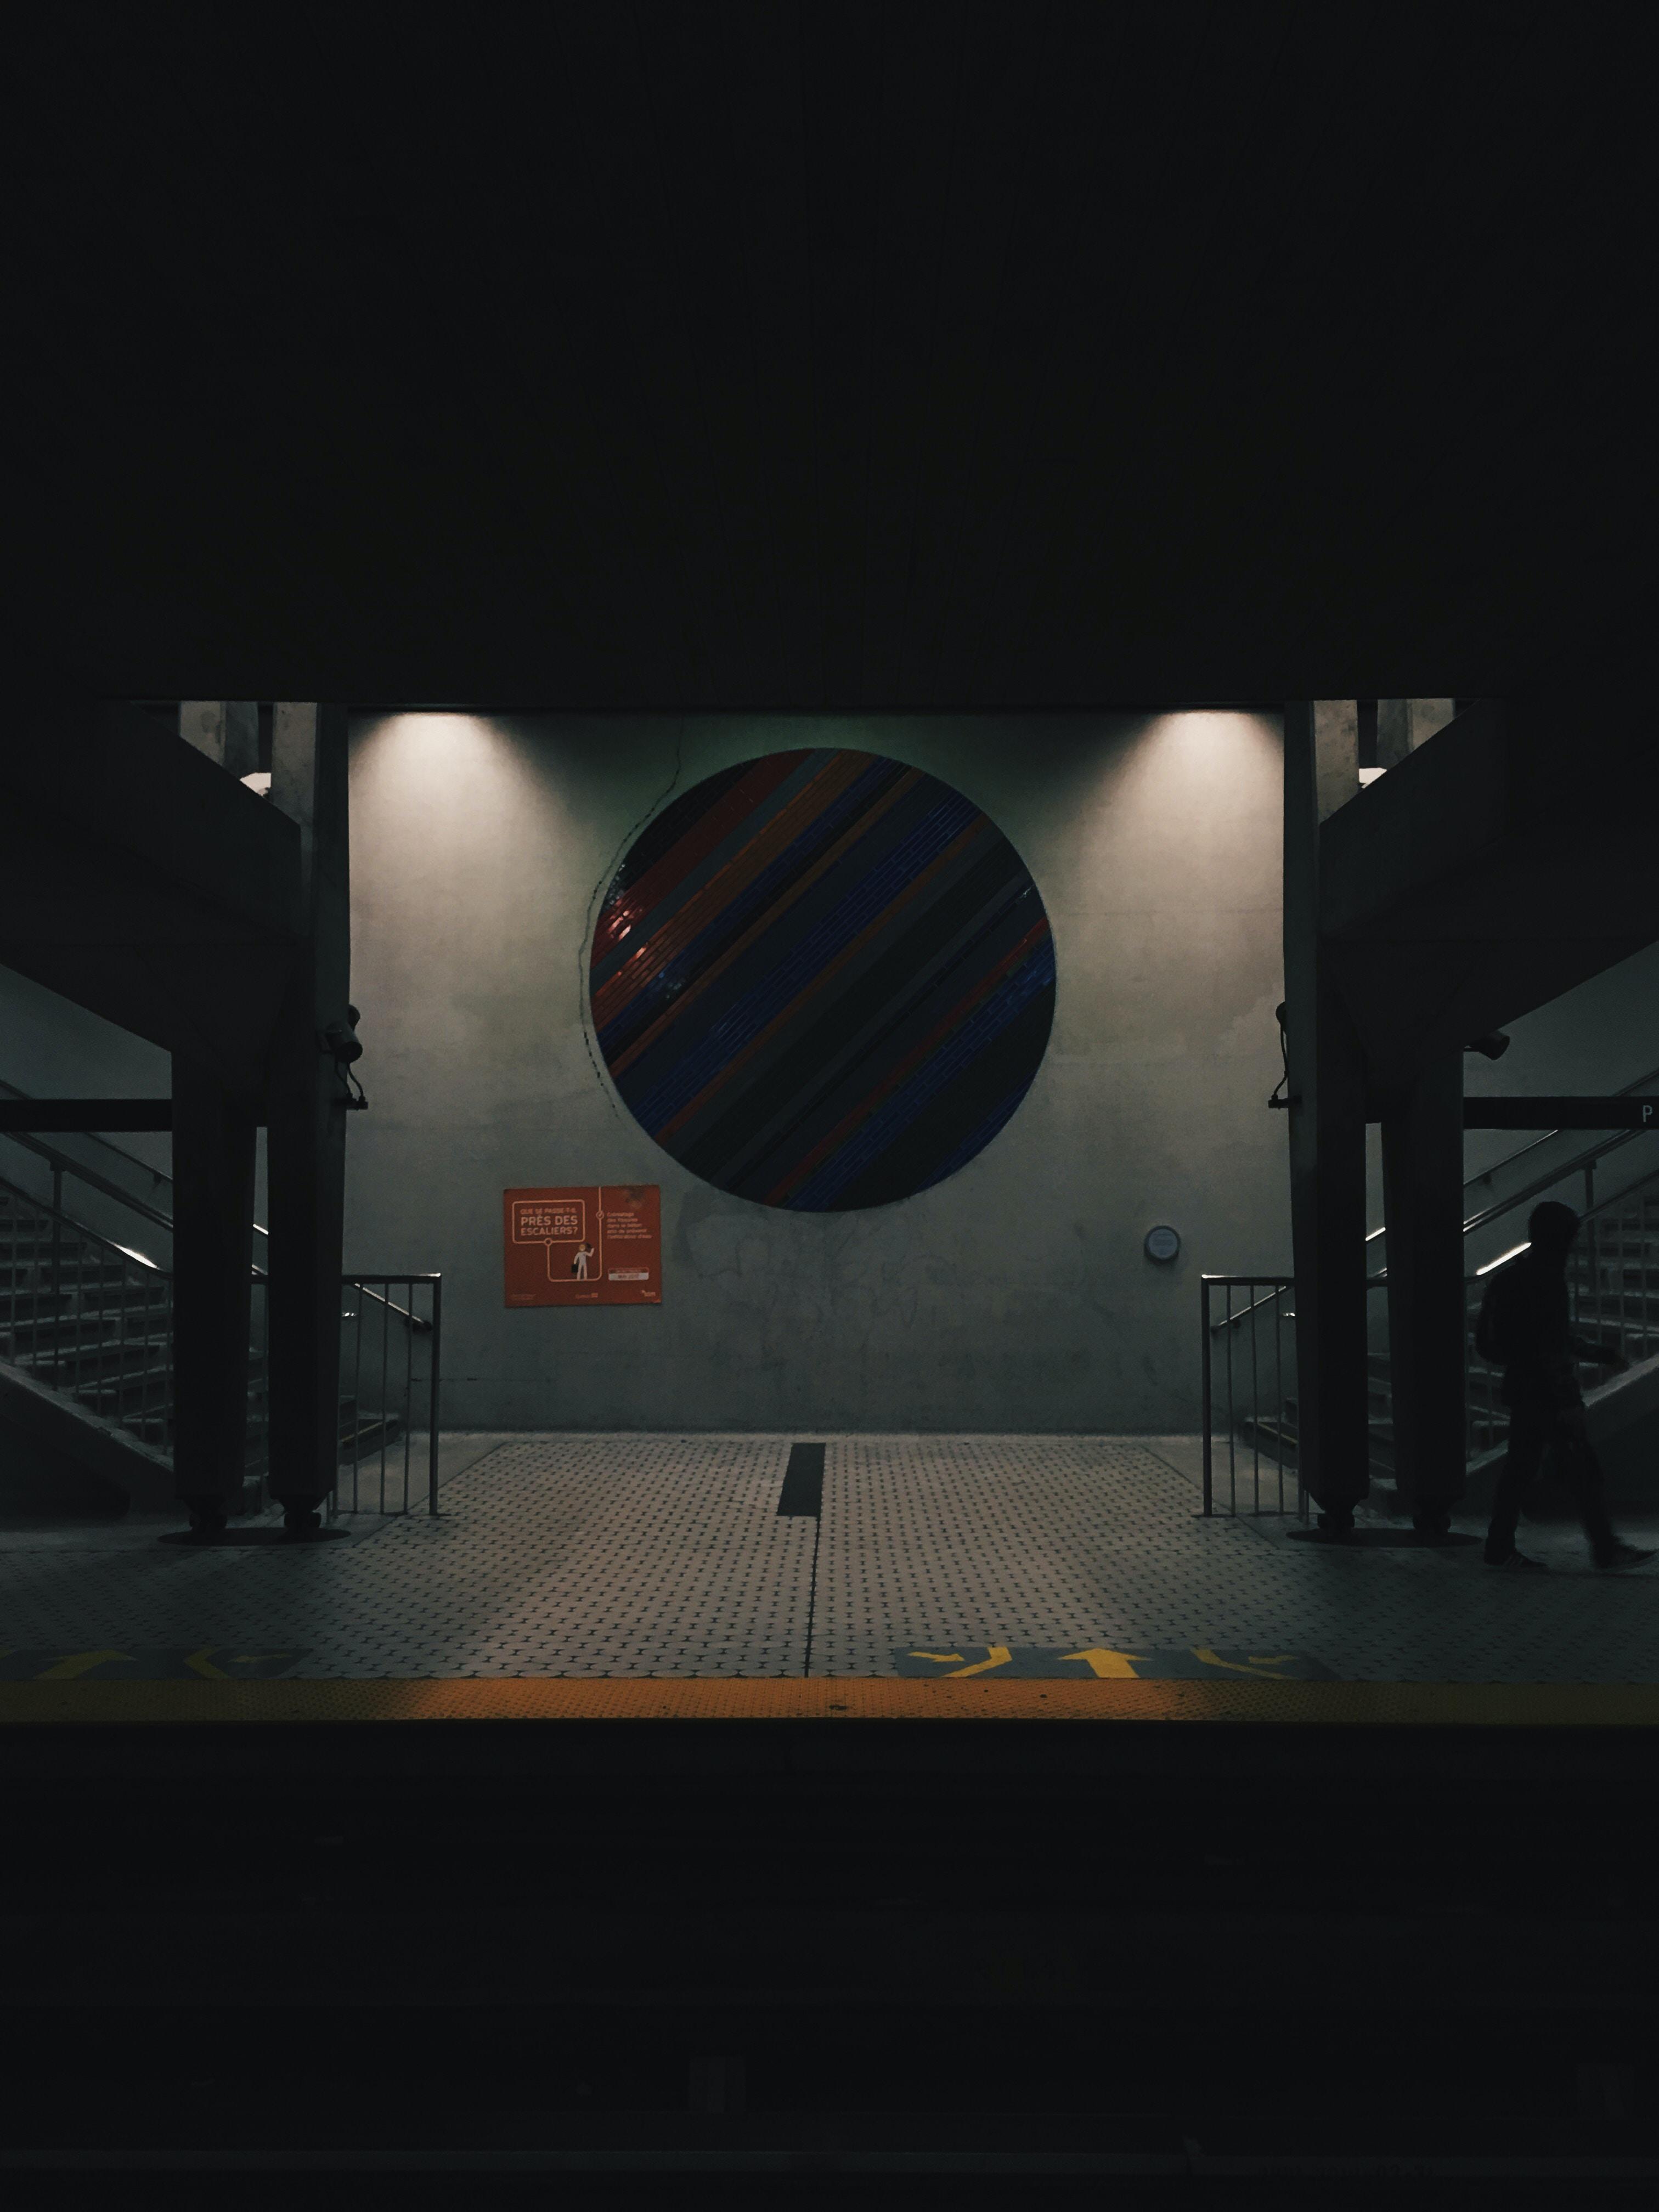 silhouette photo of man walking inside building